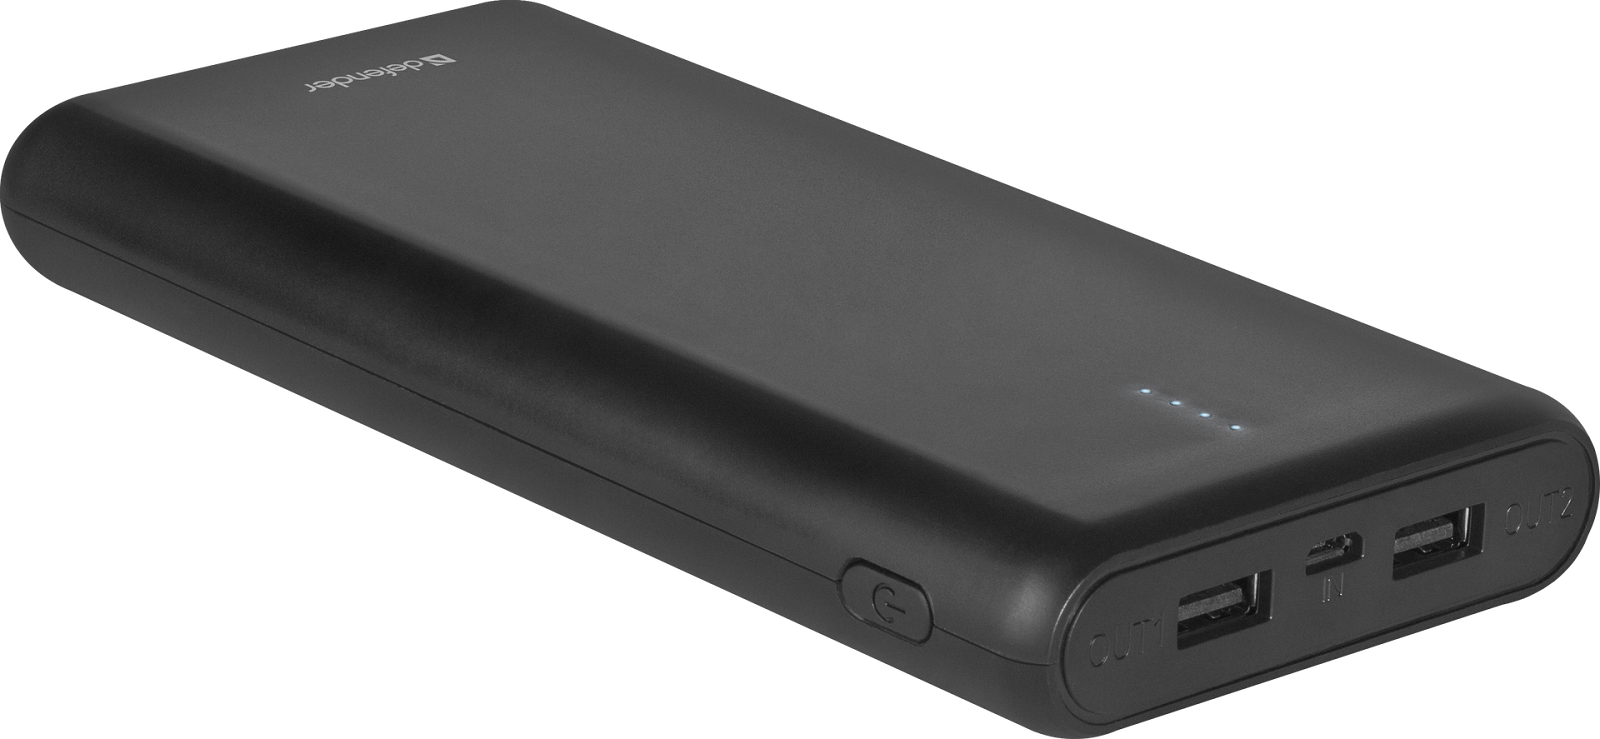 Внешний аккумулятор Defender Lavita 16000B 2 USB, 16000 mAh, 2.1A 2600mah power bank usb блок батарей 2 0 порты usb литий полимерный аккумулятор внешний аккумулятор для смартфонов светло зеленый